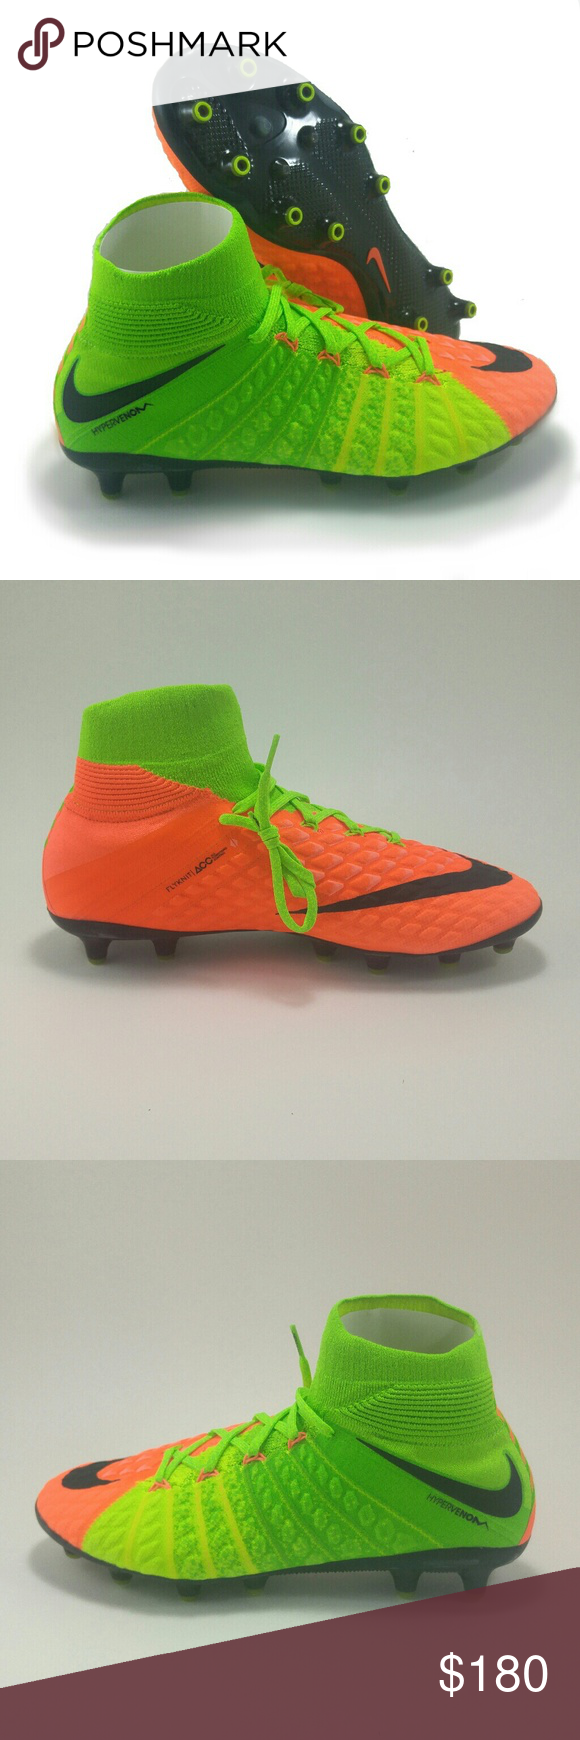 innovative design 5ba55 d314e Nike Hypervenom Phantom 3 DF AG PRO Soccer Cleats Brand New, With Box  Includes String